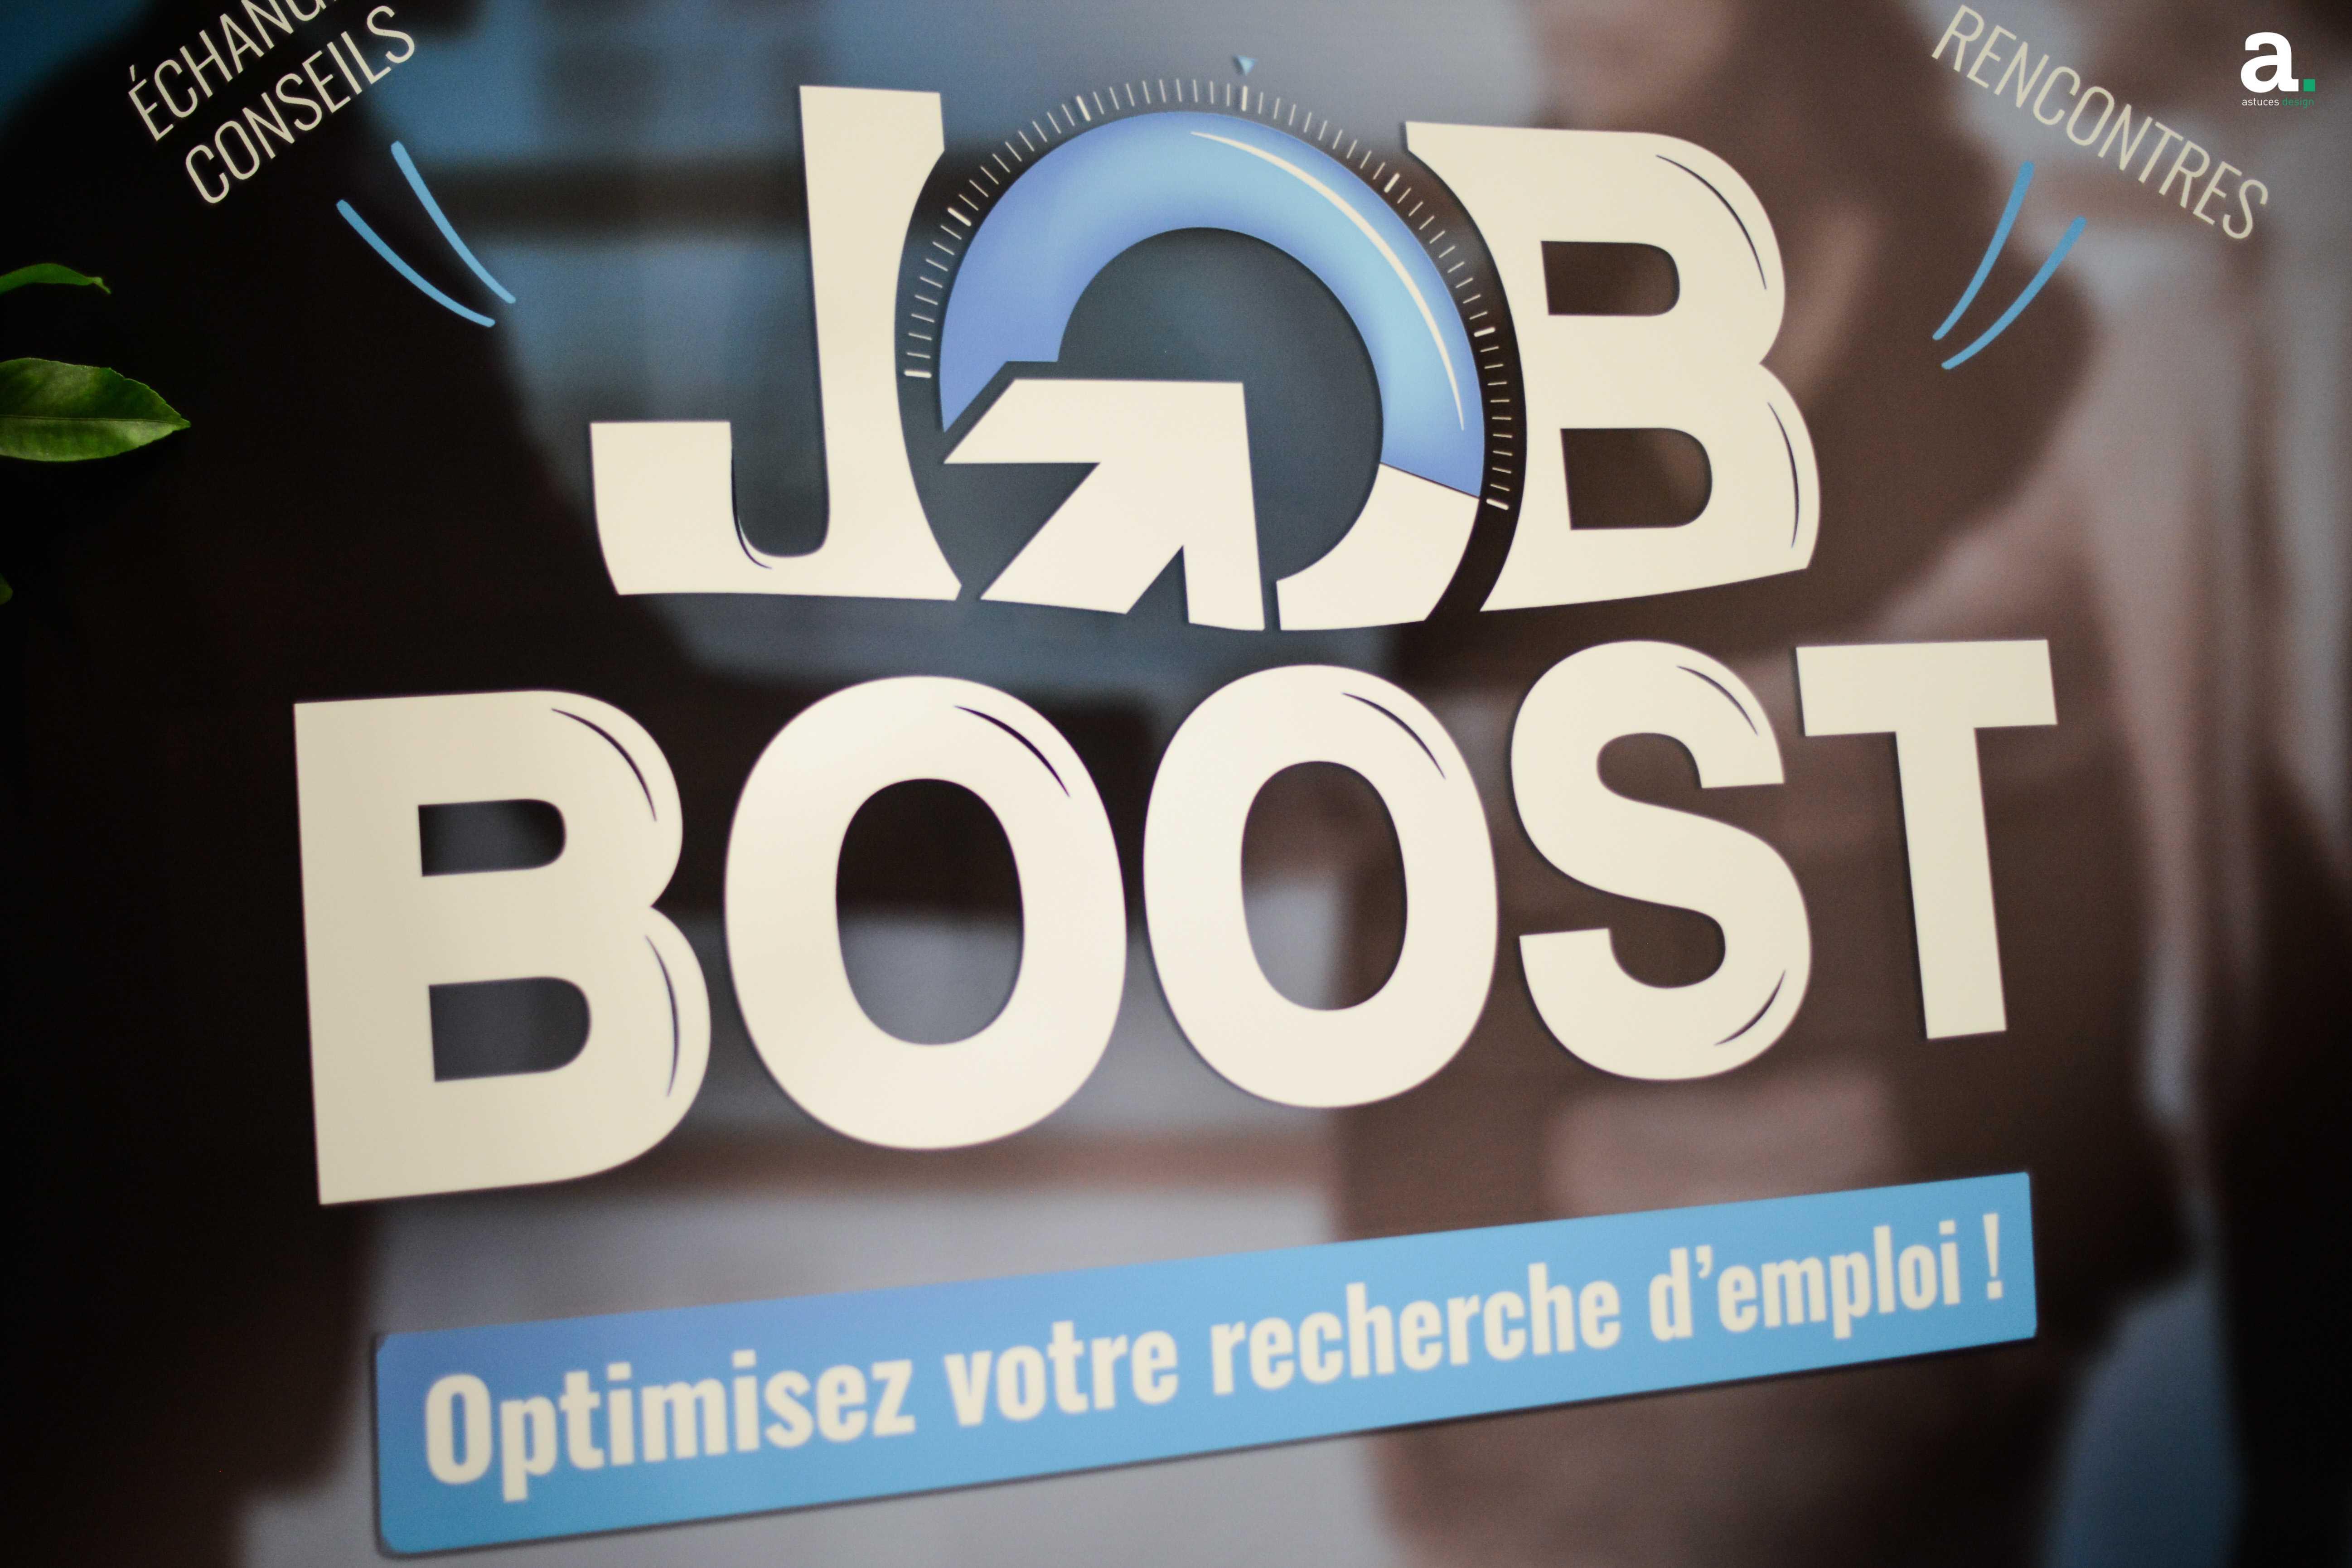 Job Boost